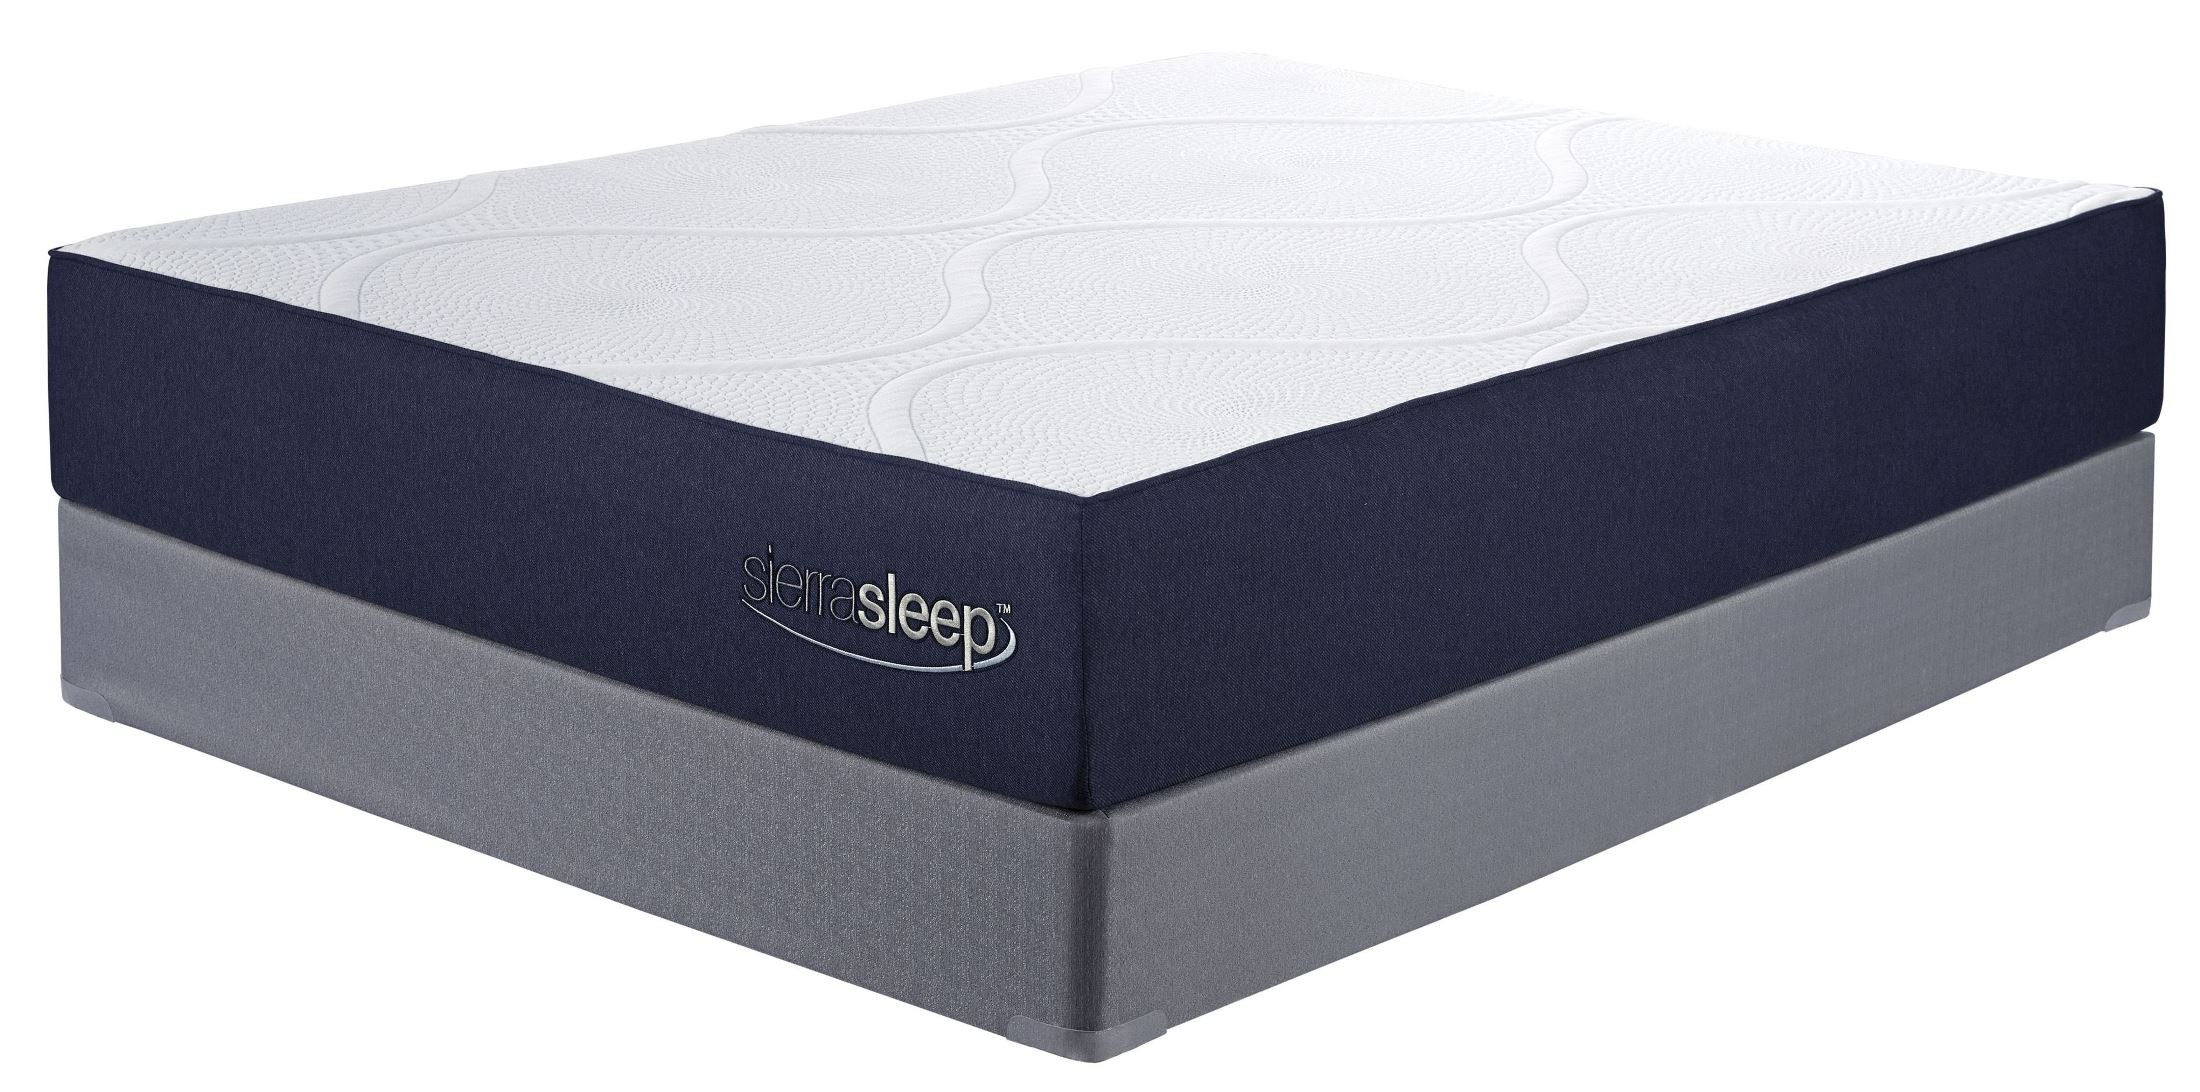 11 inch gel memory foam white king mattress with foundation m97341 m81x42 2 ashley. Black Bedroom Furniture Sets. Home Design Ideas